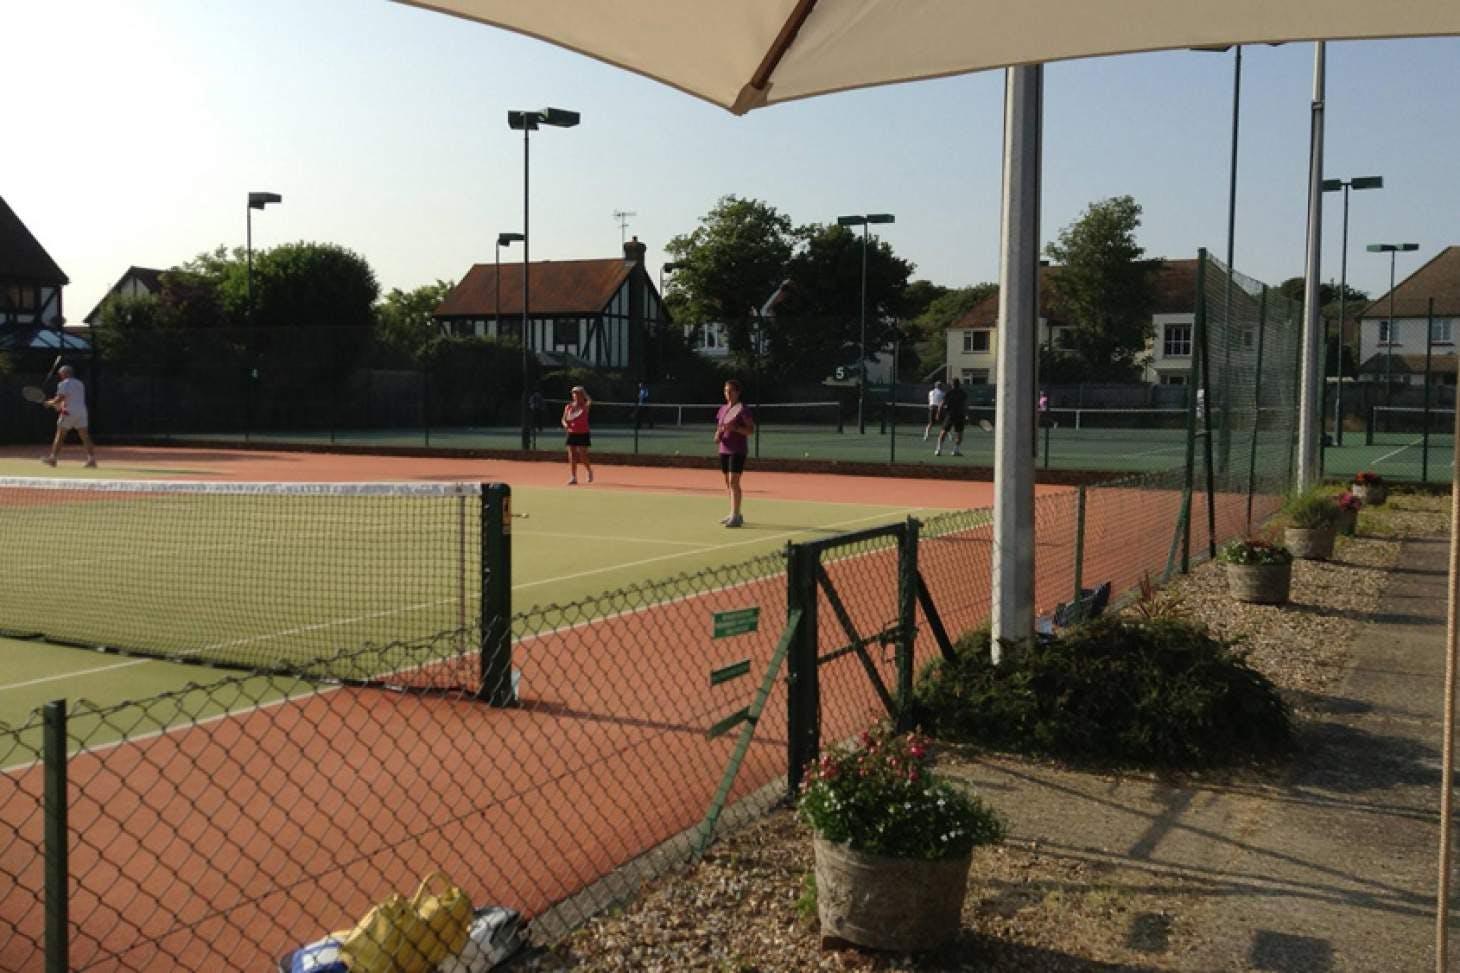 Sussex County Lawn Tennis Club Outdoor | Astroturf tennis court